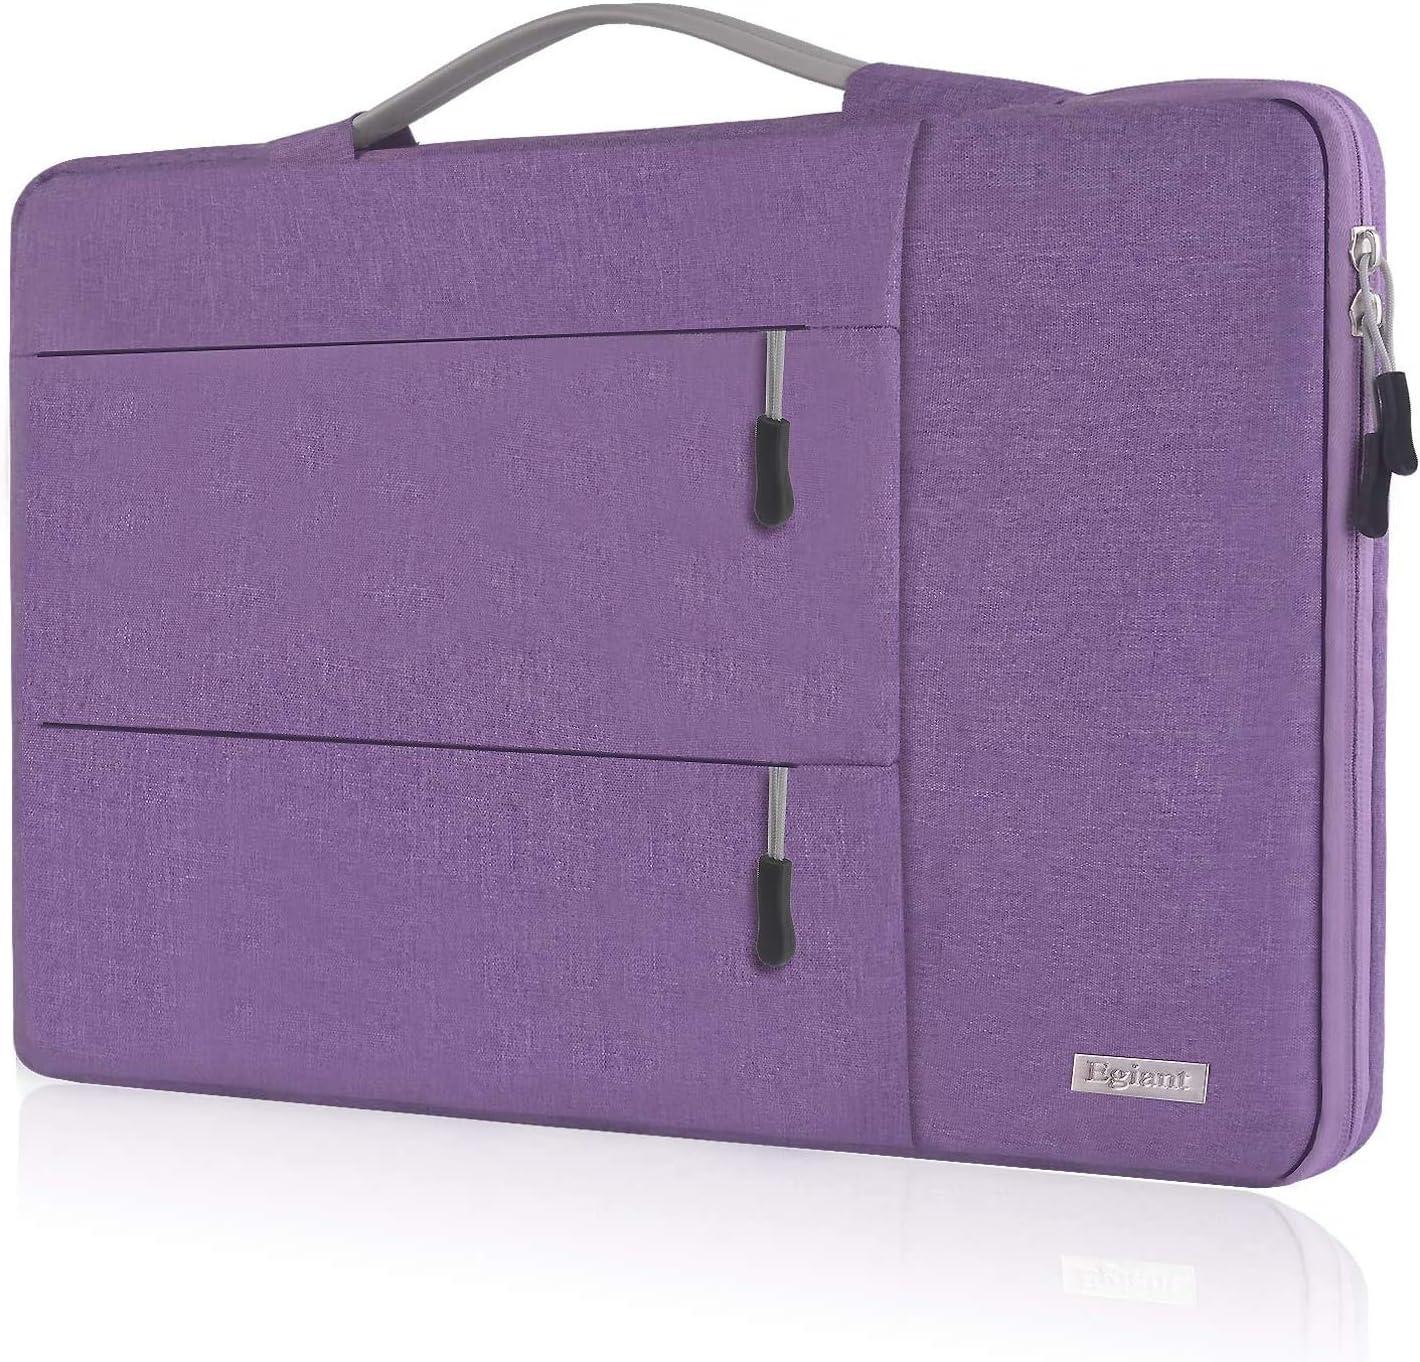 Egiant 14 inch Laptop Sleeve Case,360° Protective Handbag for HP Chromebook 14,Acer Spin 3/Aspire 1,Dell Inspiron 14/Latitude,Lenovo Flex 14,ASUS VivoBook Zenbook,Water-Resistant Notebook Bag,Purple